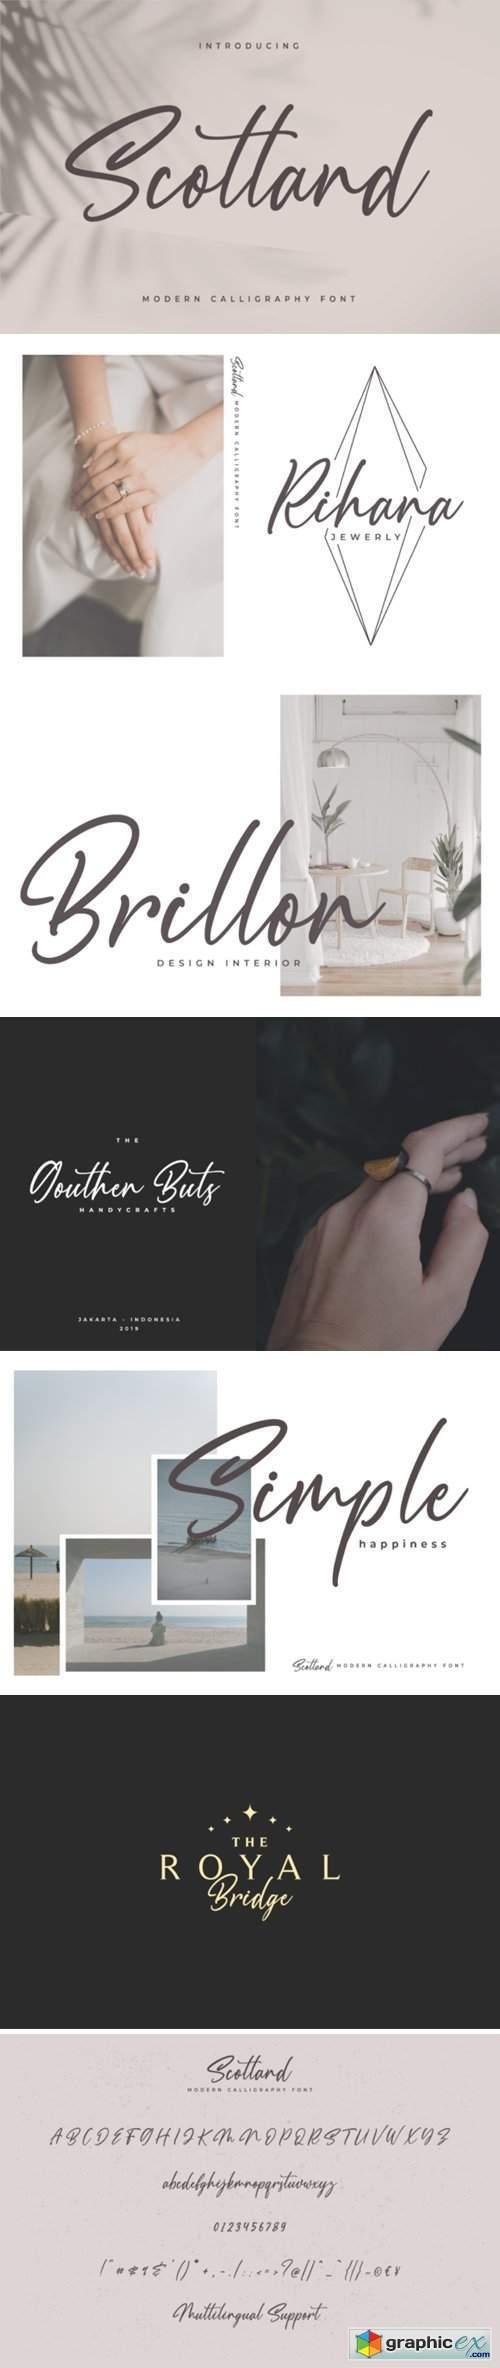 Scotland - Modern Calligraphy font